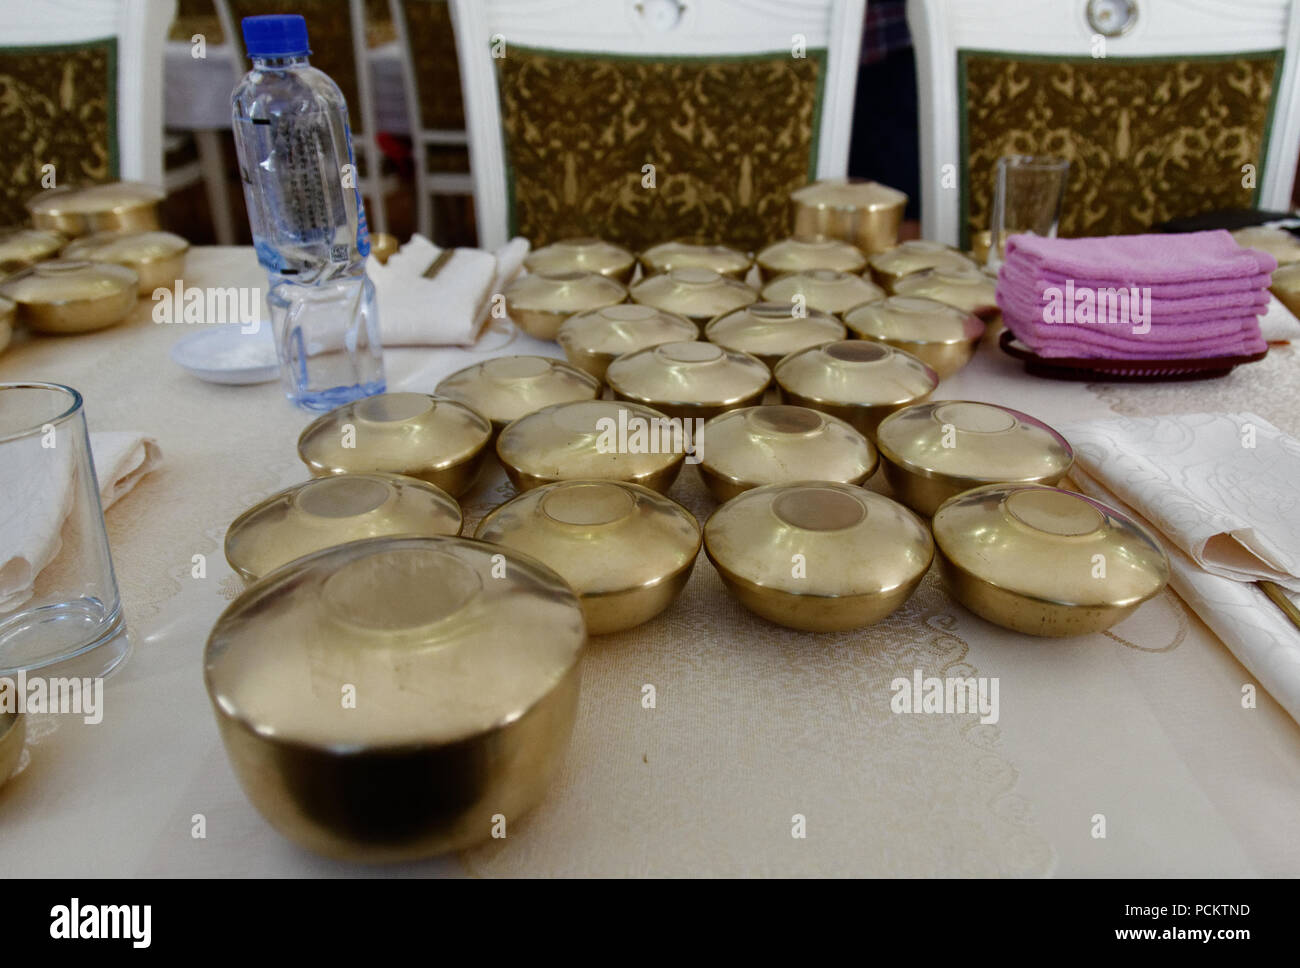 golden bowls and lids containing a sampling menu of north korean